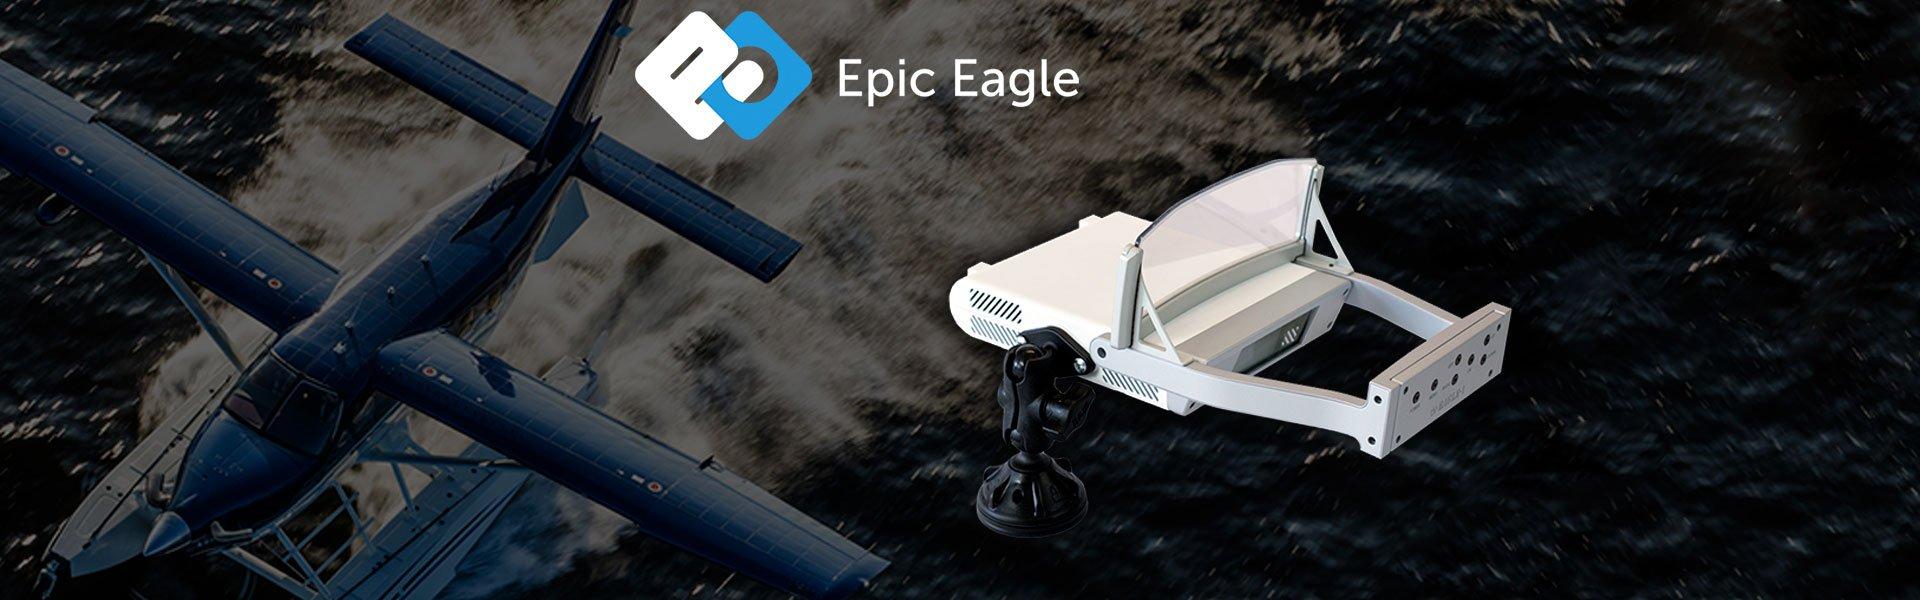 Epic Eagle HUD - Heads Up Display - Banyan Pilot Shop